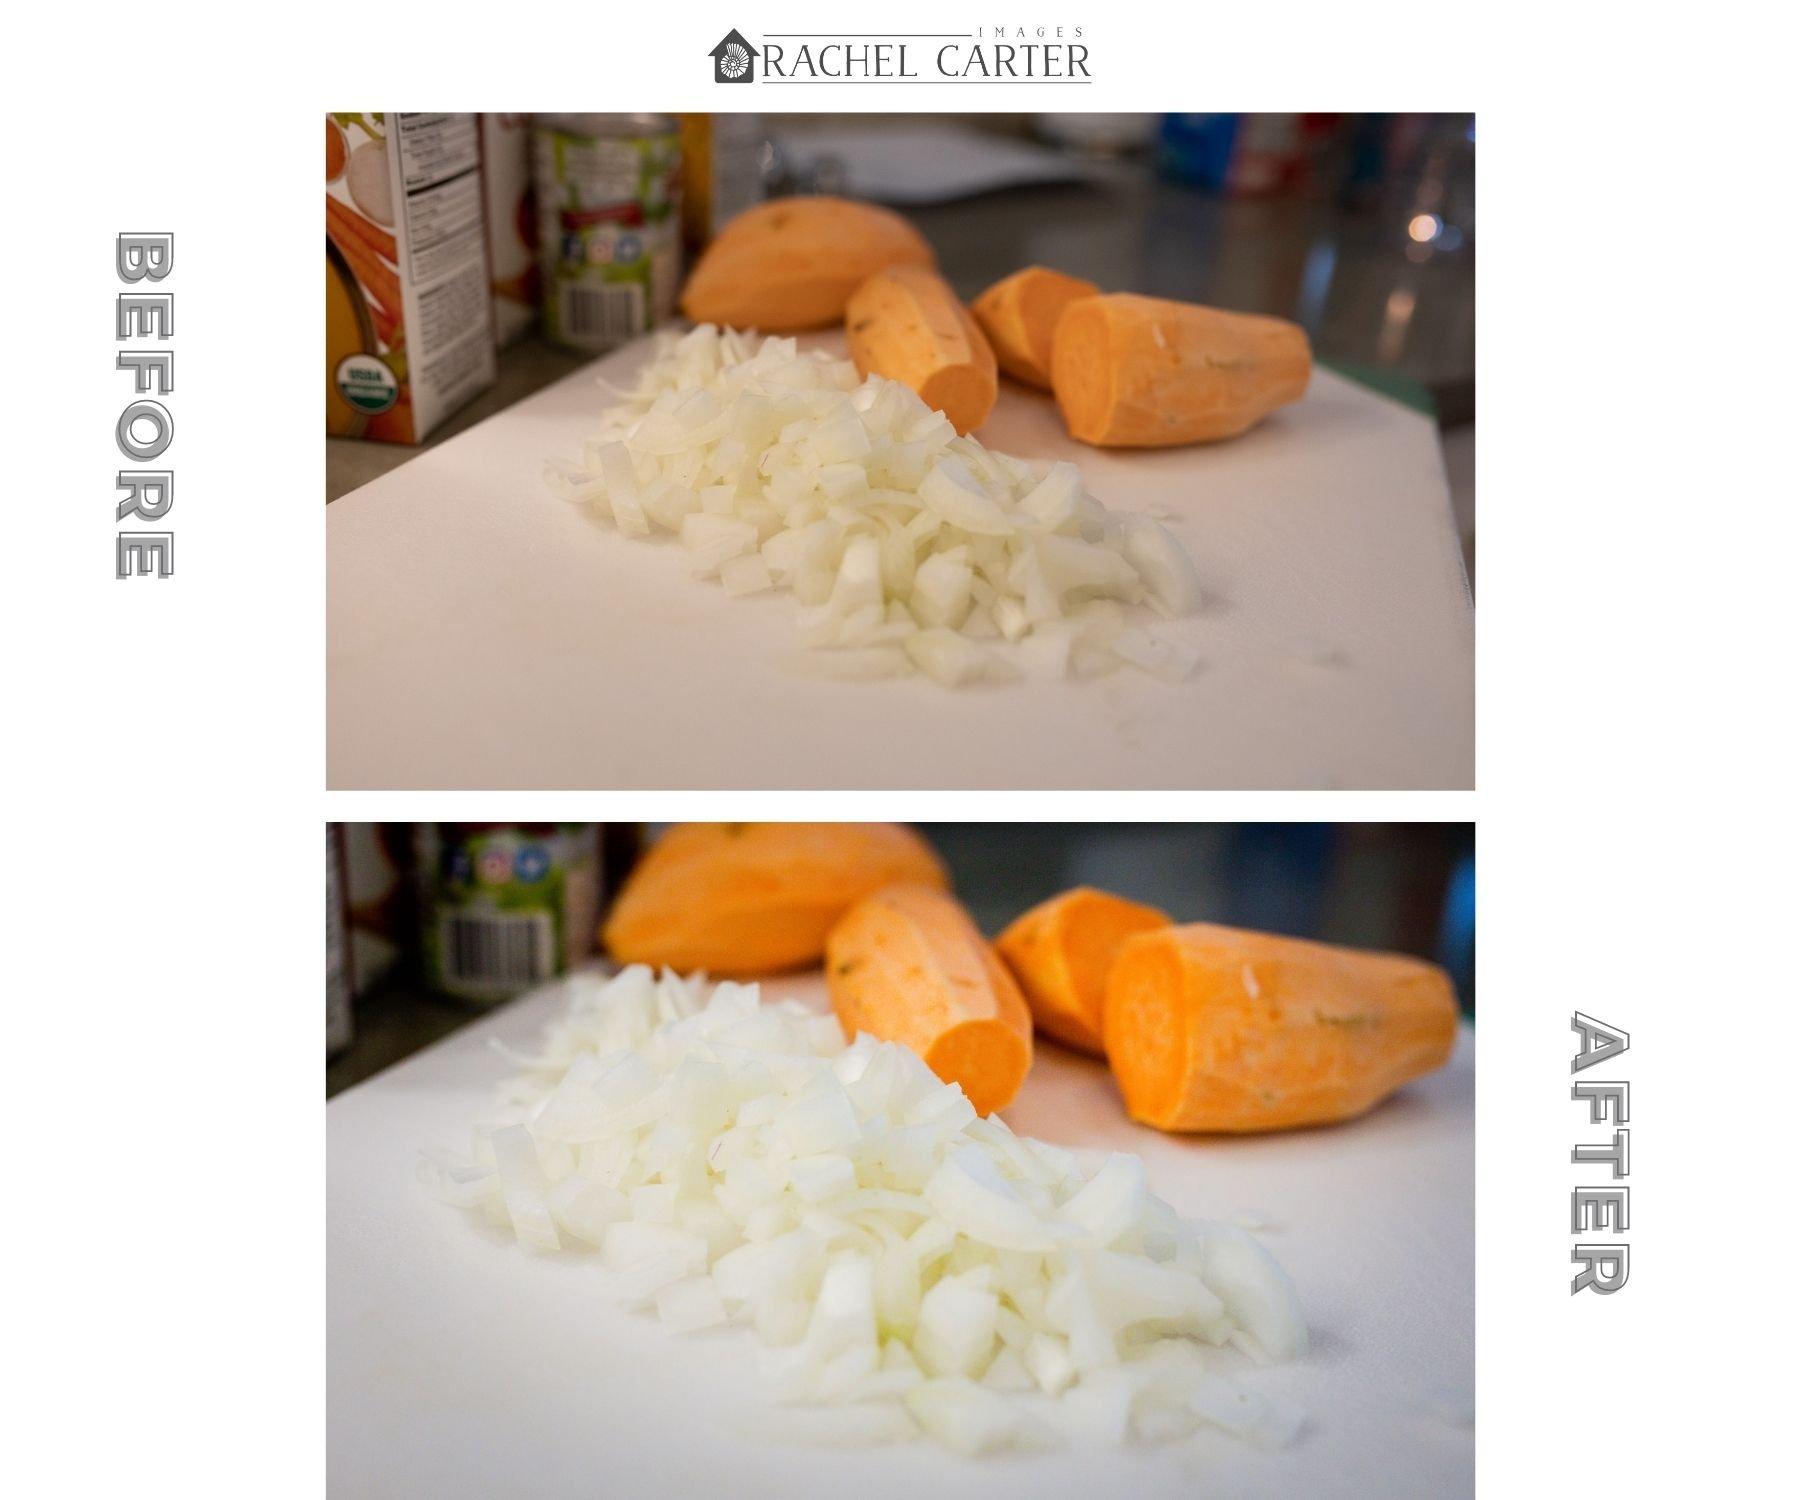 Onions for Sweet Potato Chili